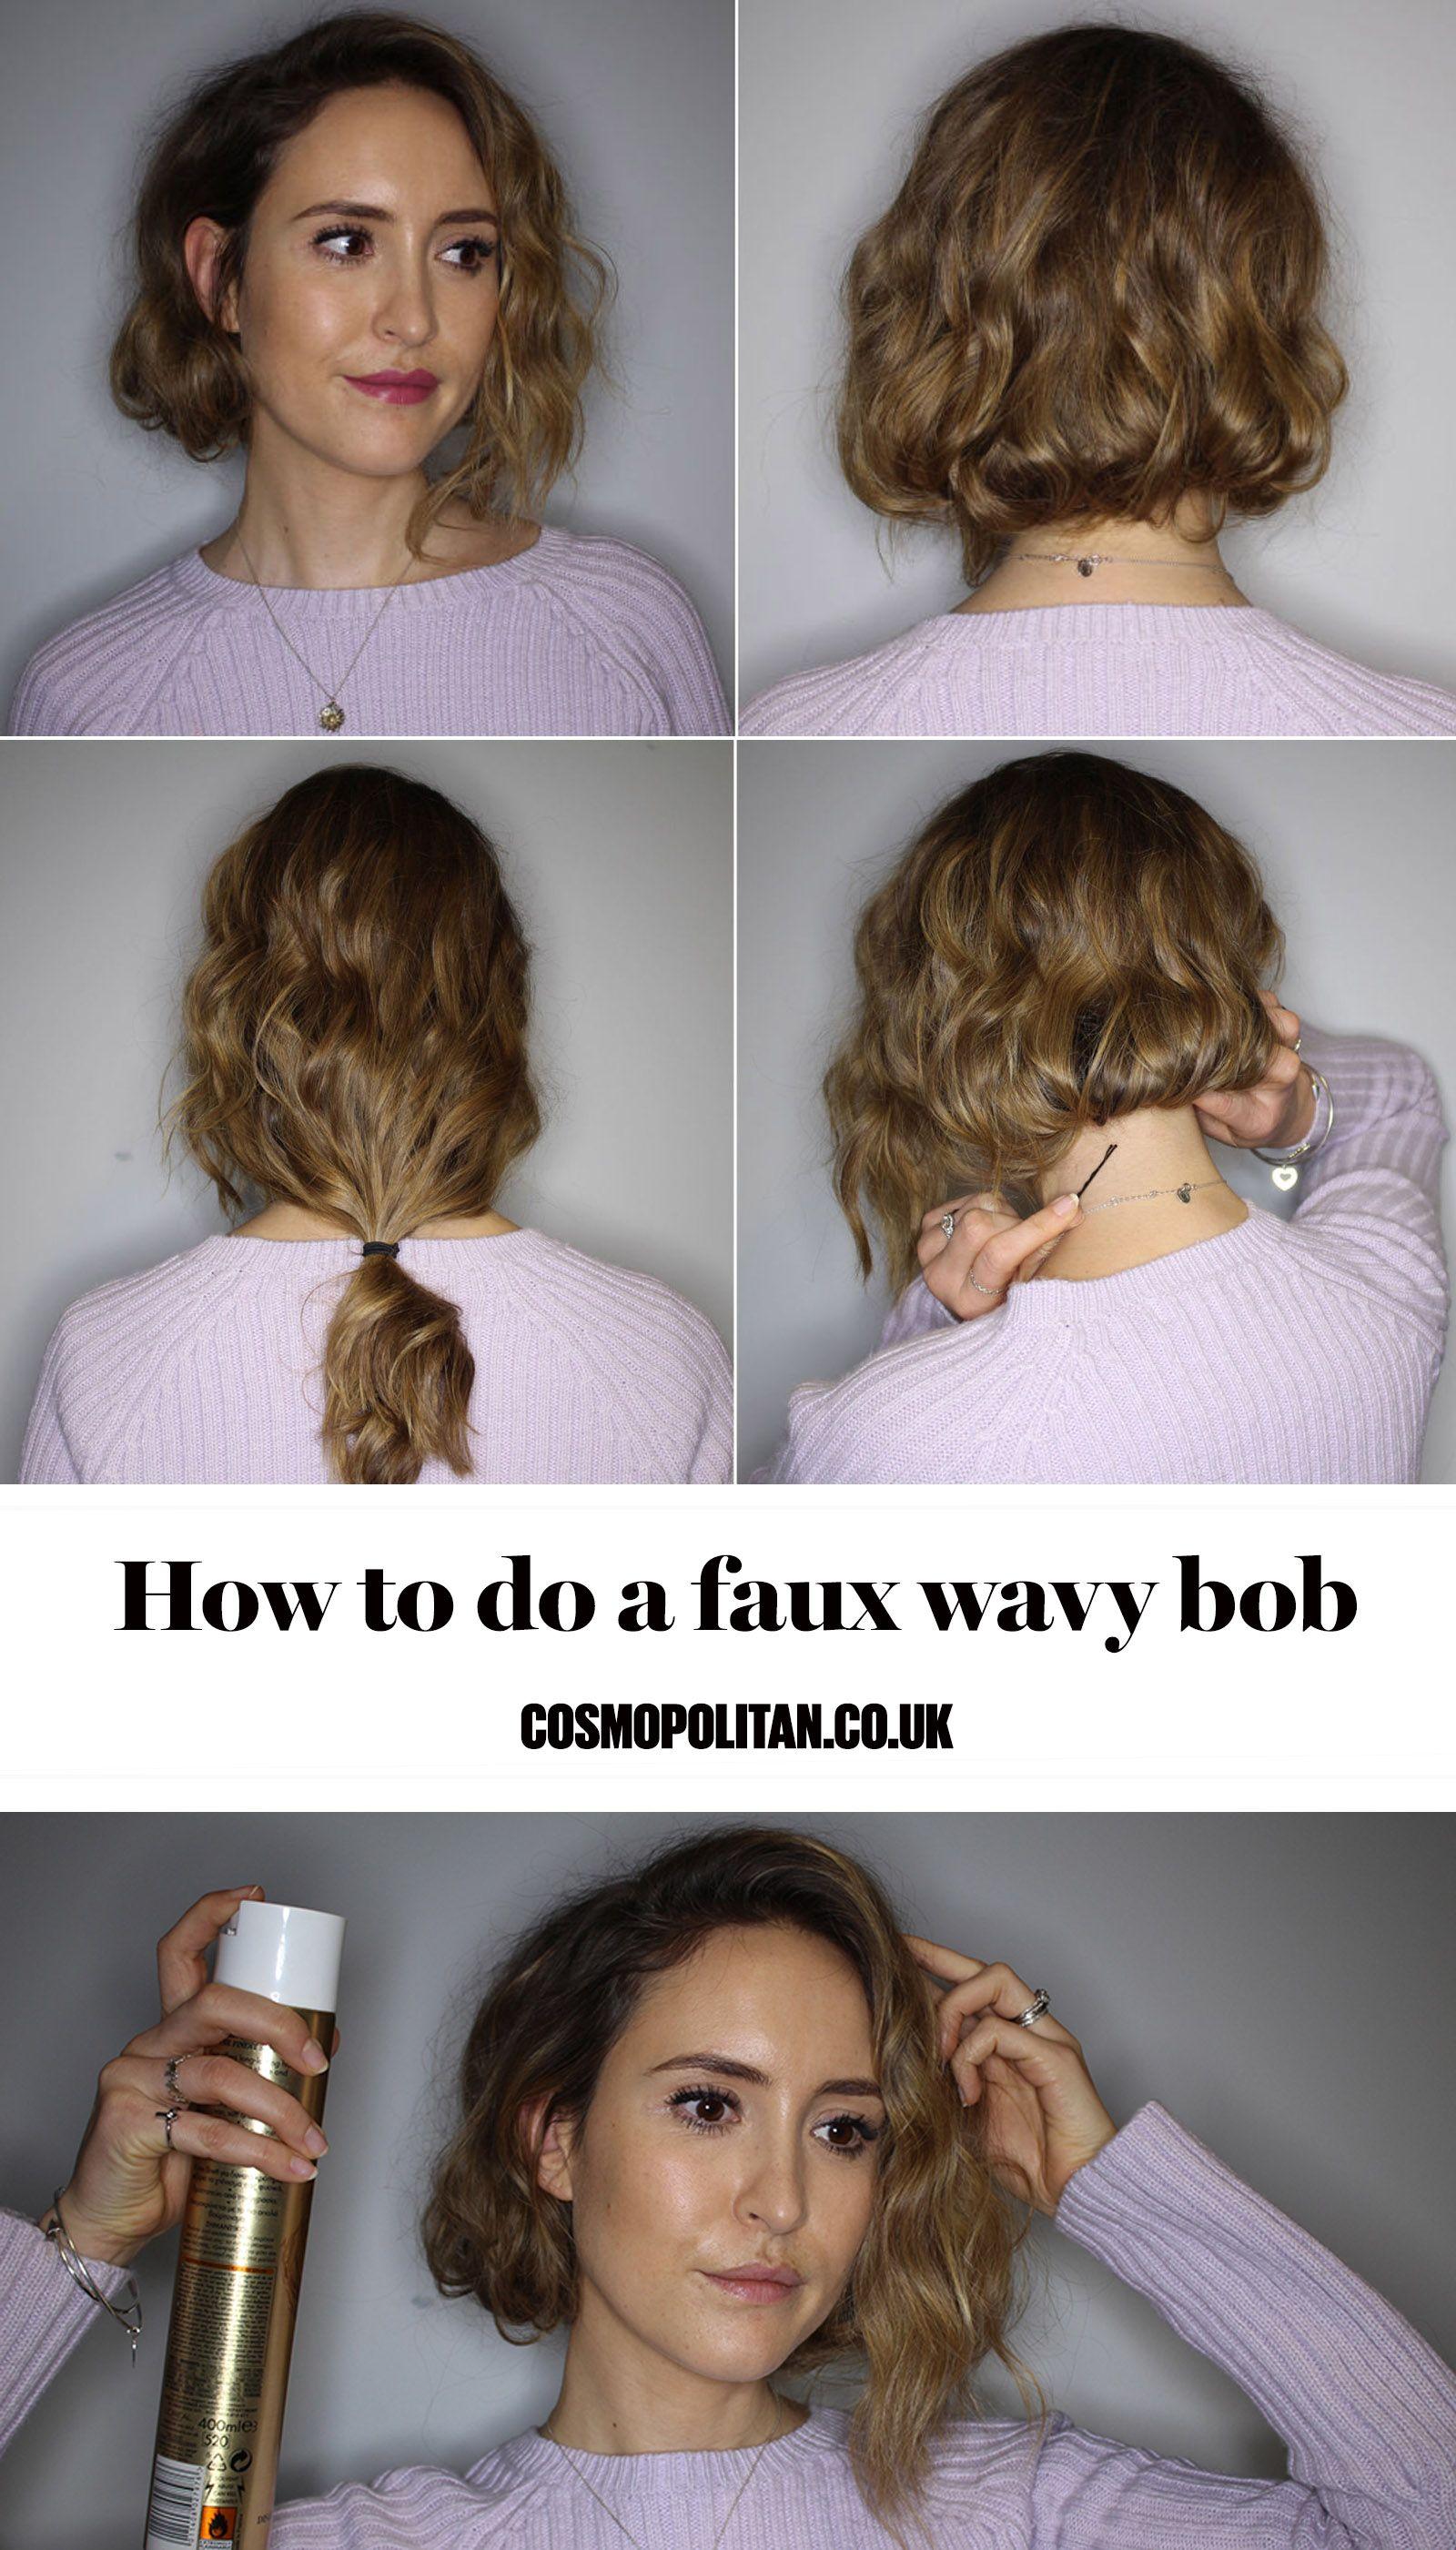 Hair howto the faux uwobu hair ideas pinterest long wavy